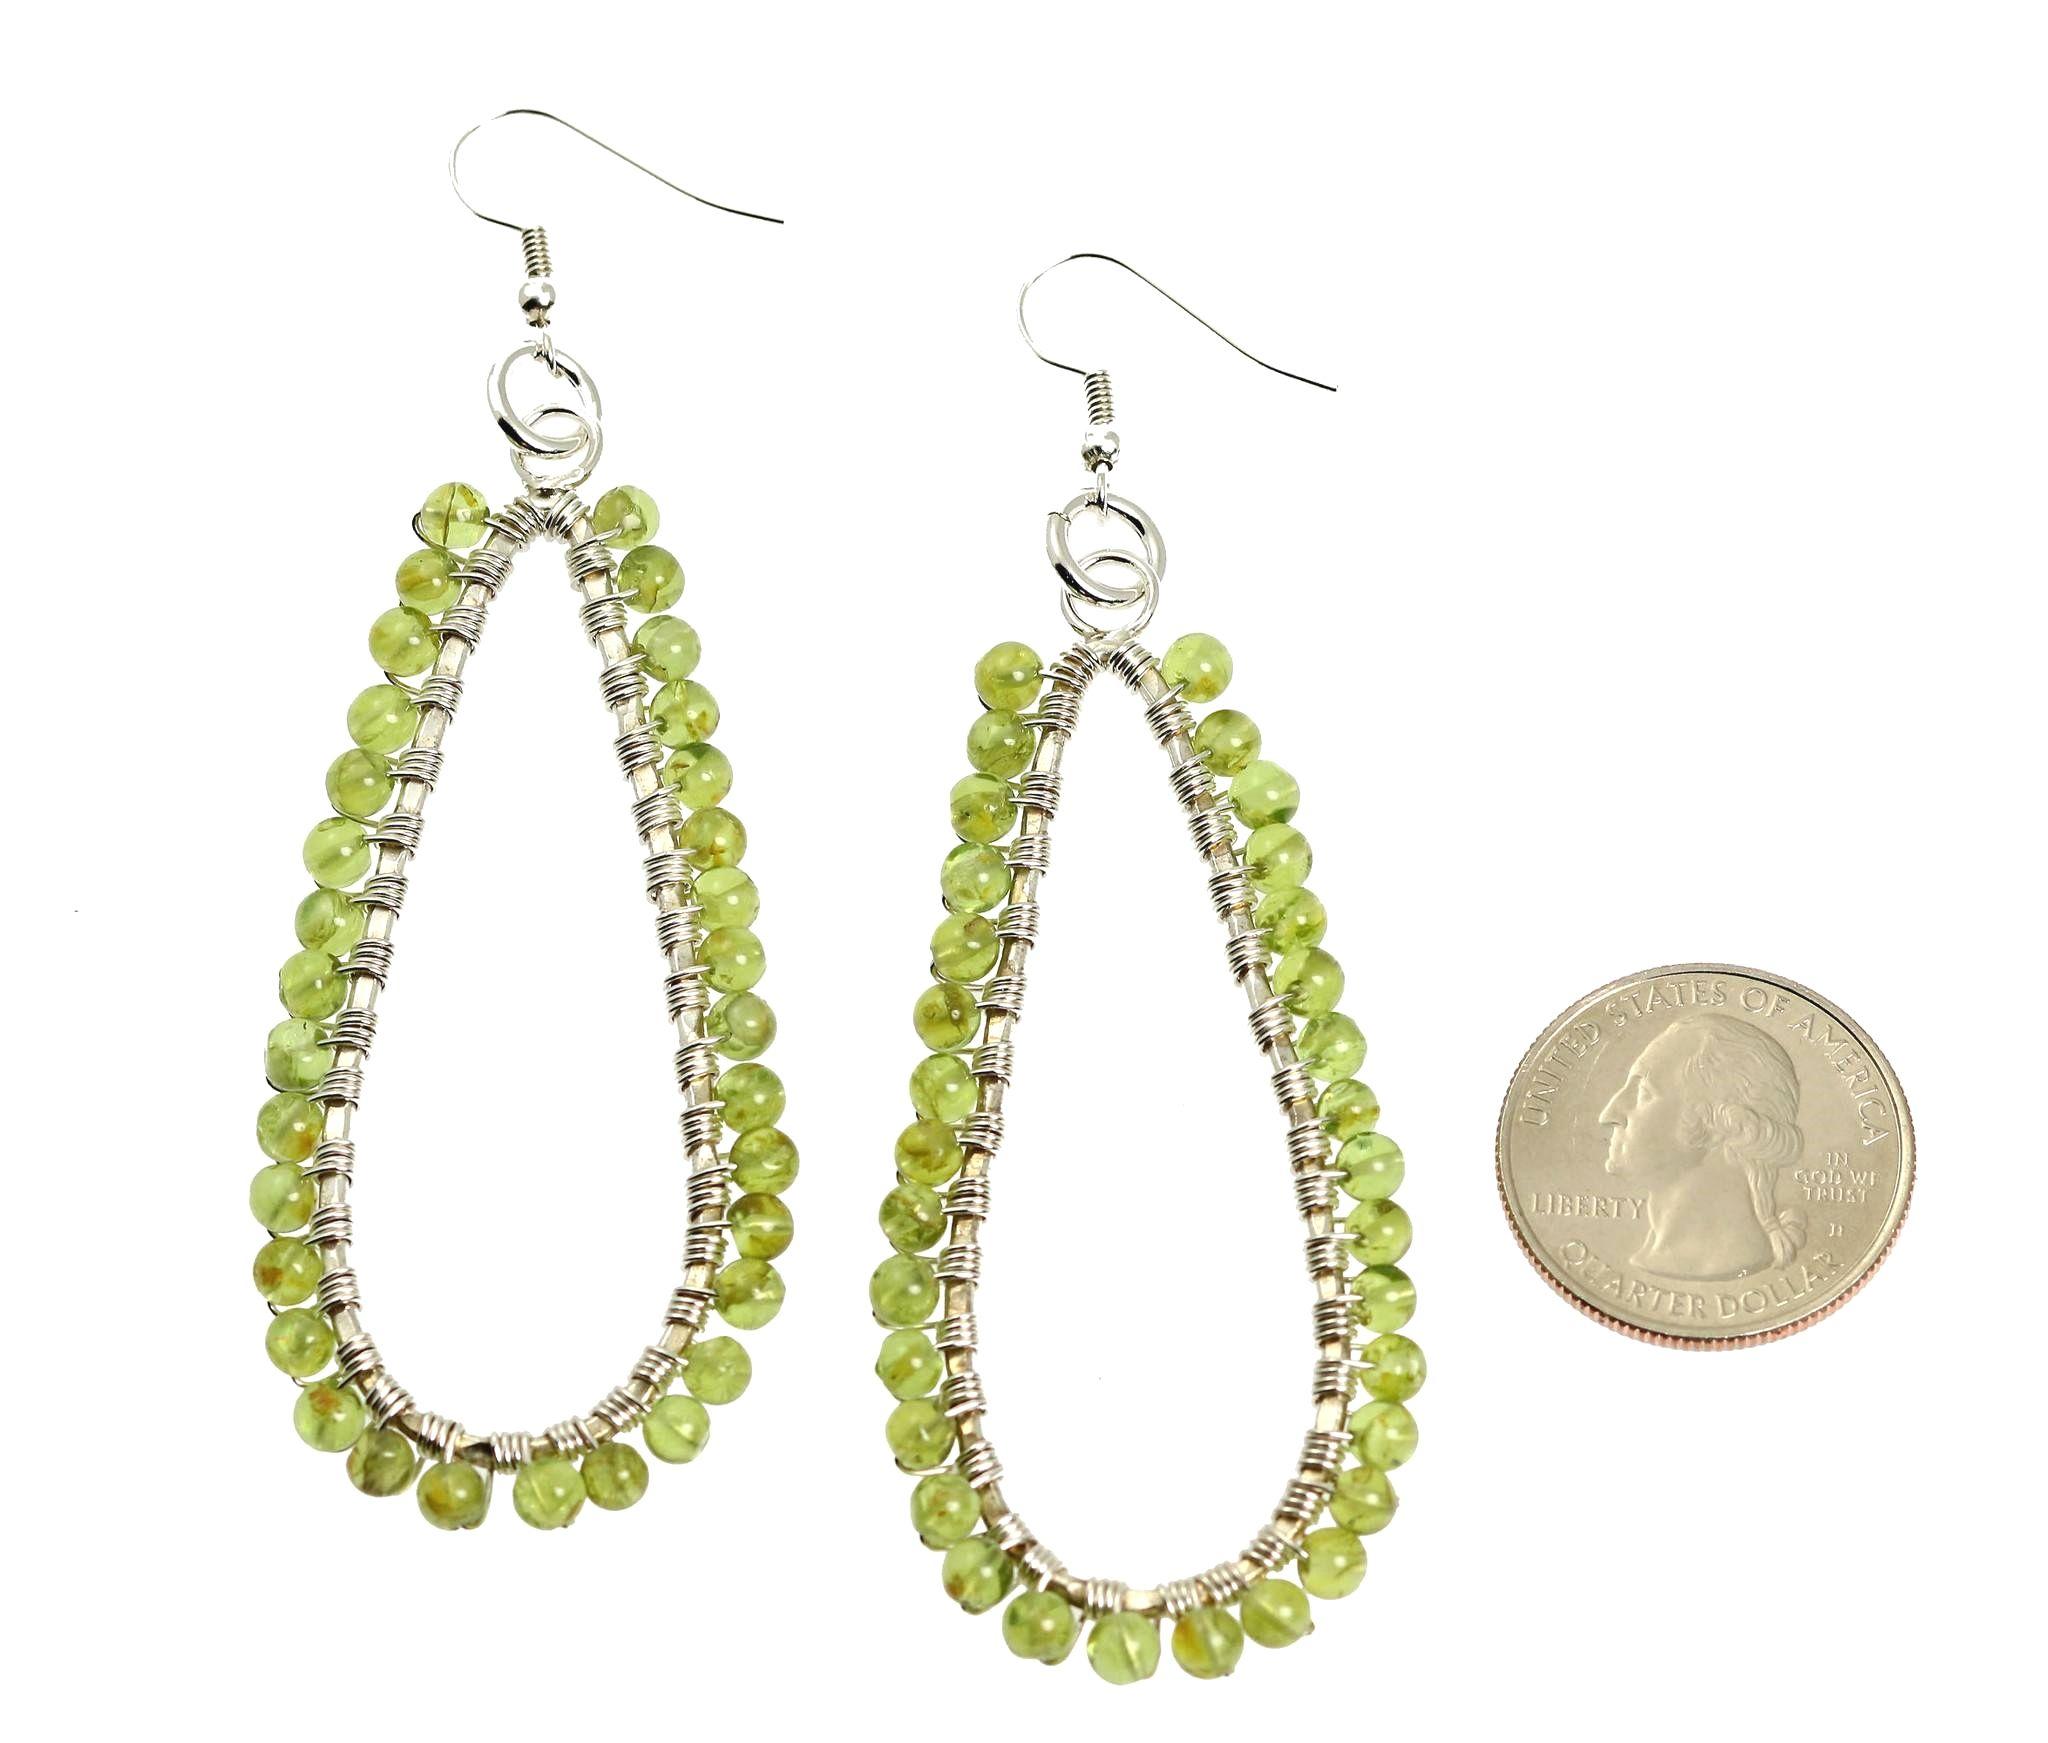 NEW! Cool Hammered Silver Peridot Statement Earrings https://www.johnsbrana.com/products/hammered-fine-silver-wire-wrapped-tear-drop-peridot-earrings #JohnSBrana #SilverJewelry #Handcrafted